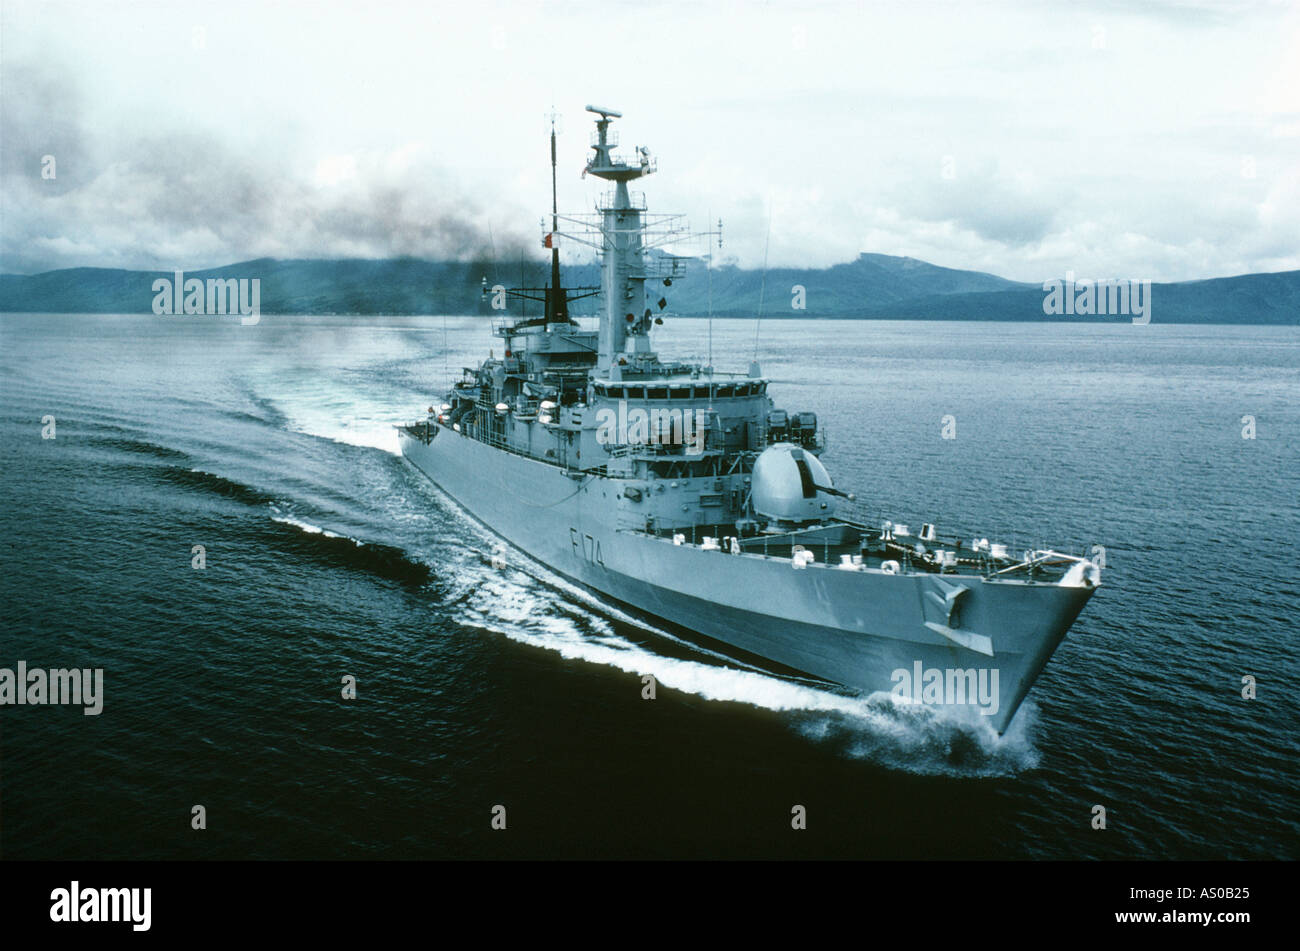 Royal Navy Frigate - Stock Image